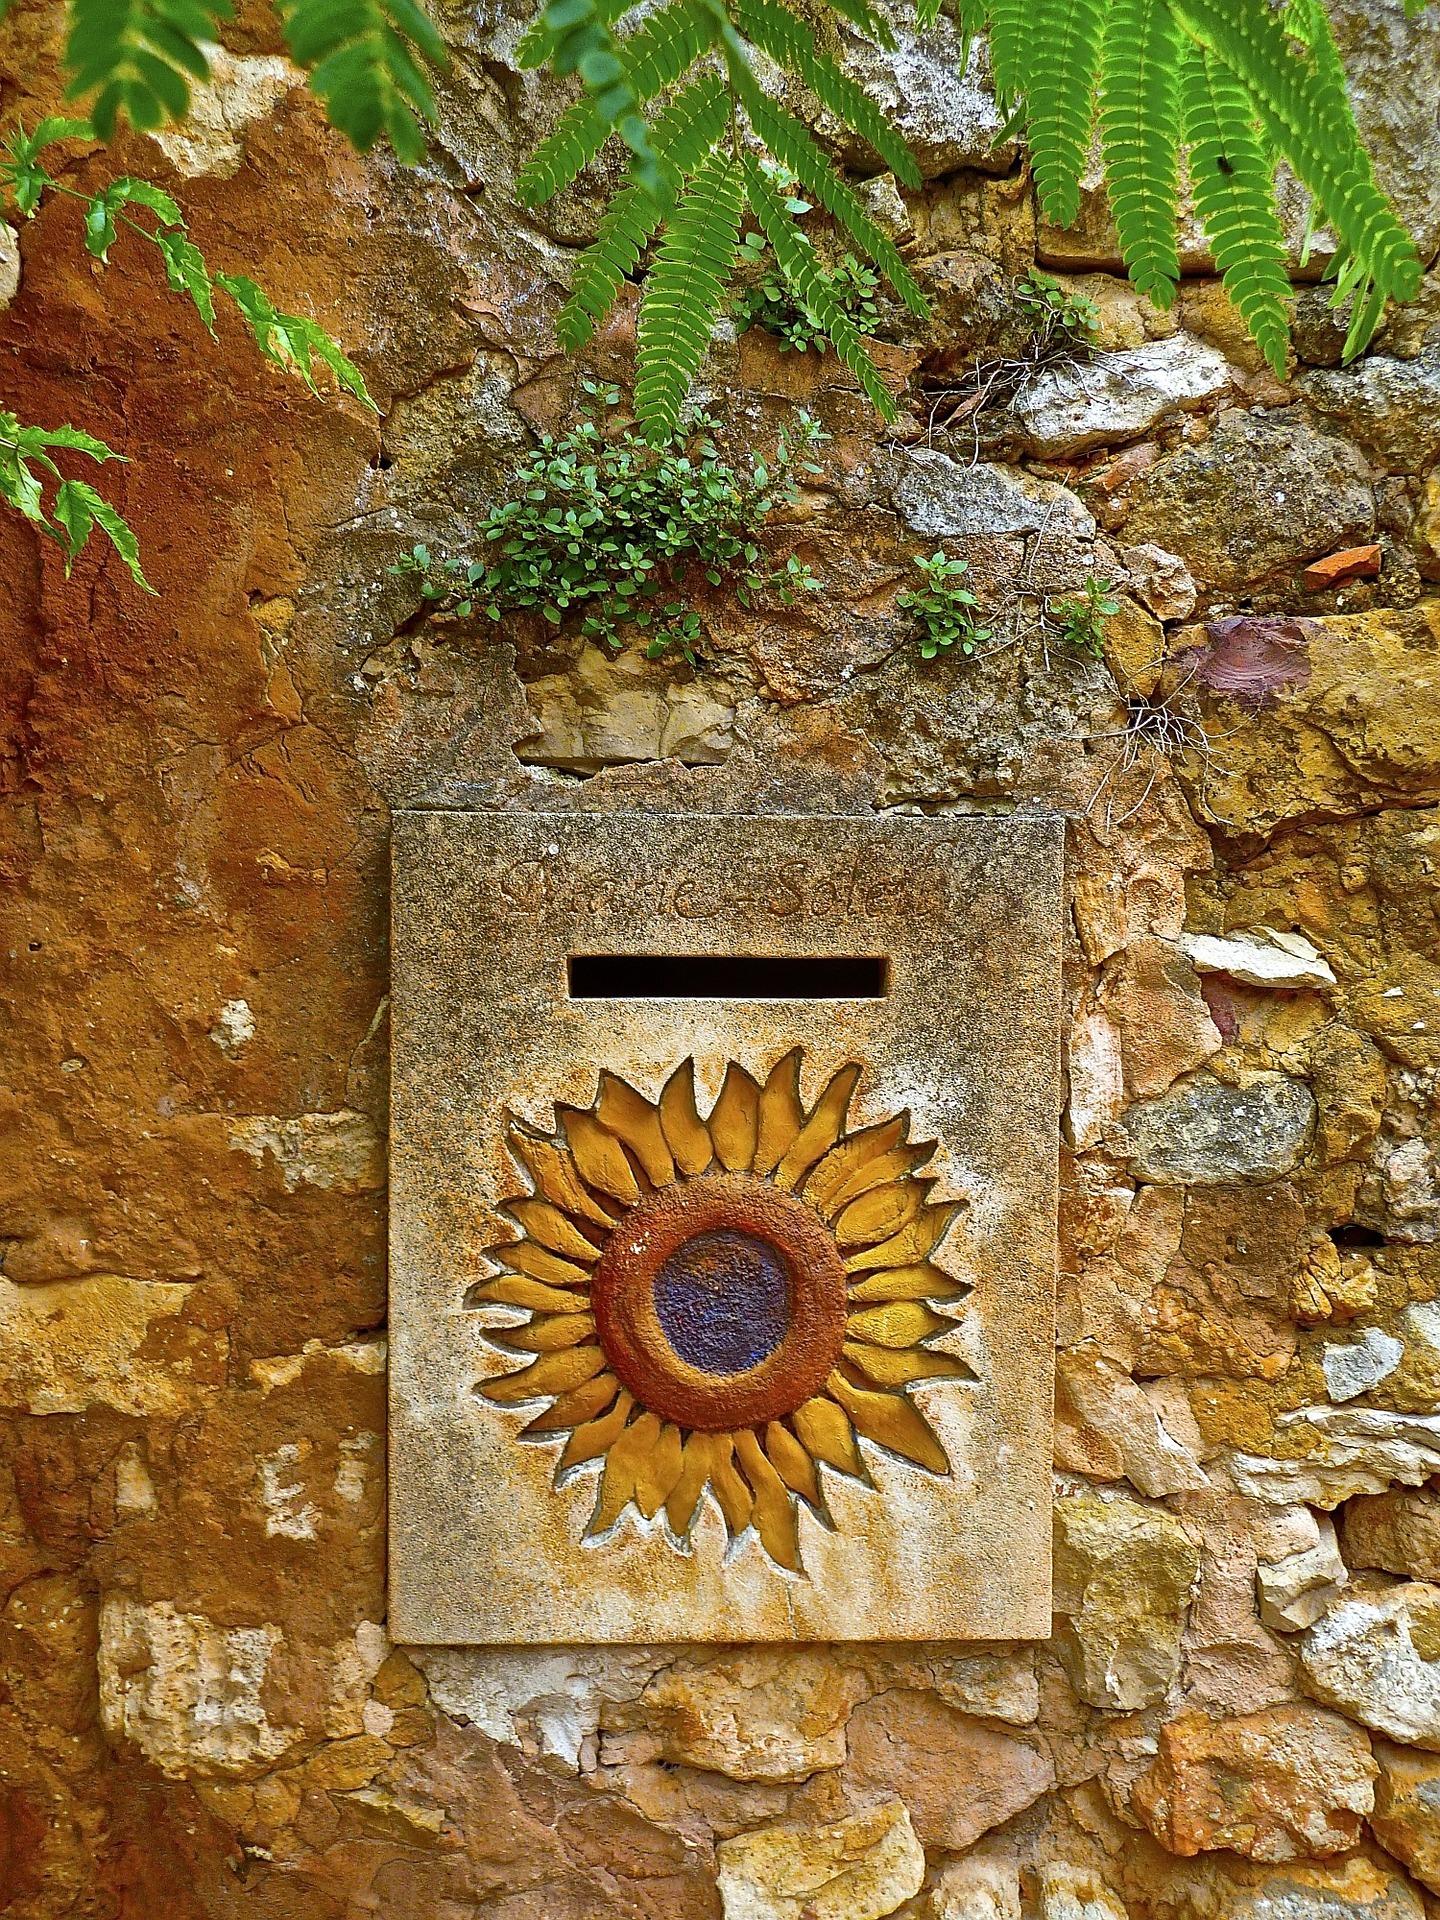 letterbox-972224_1920